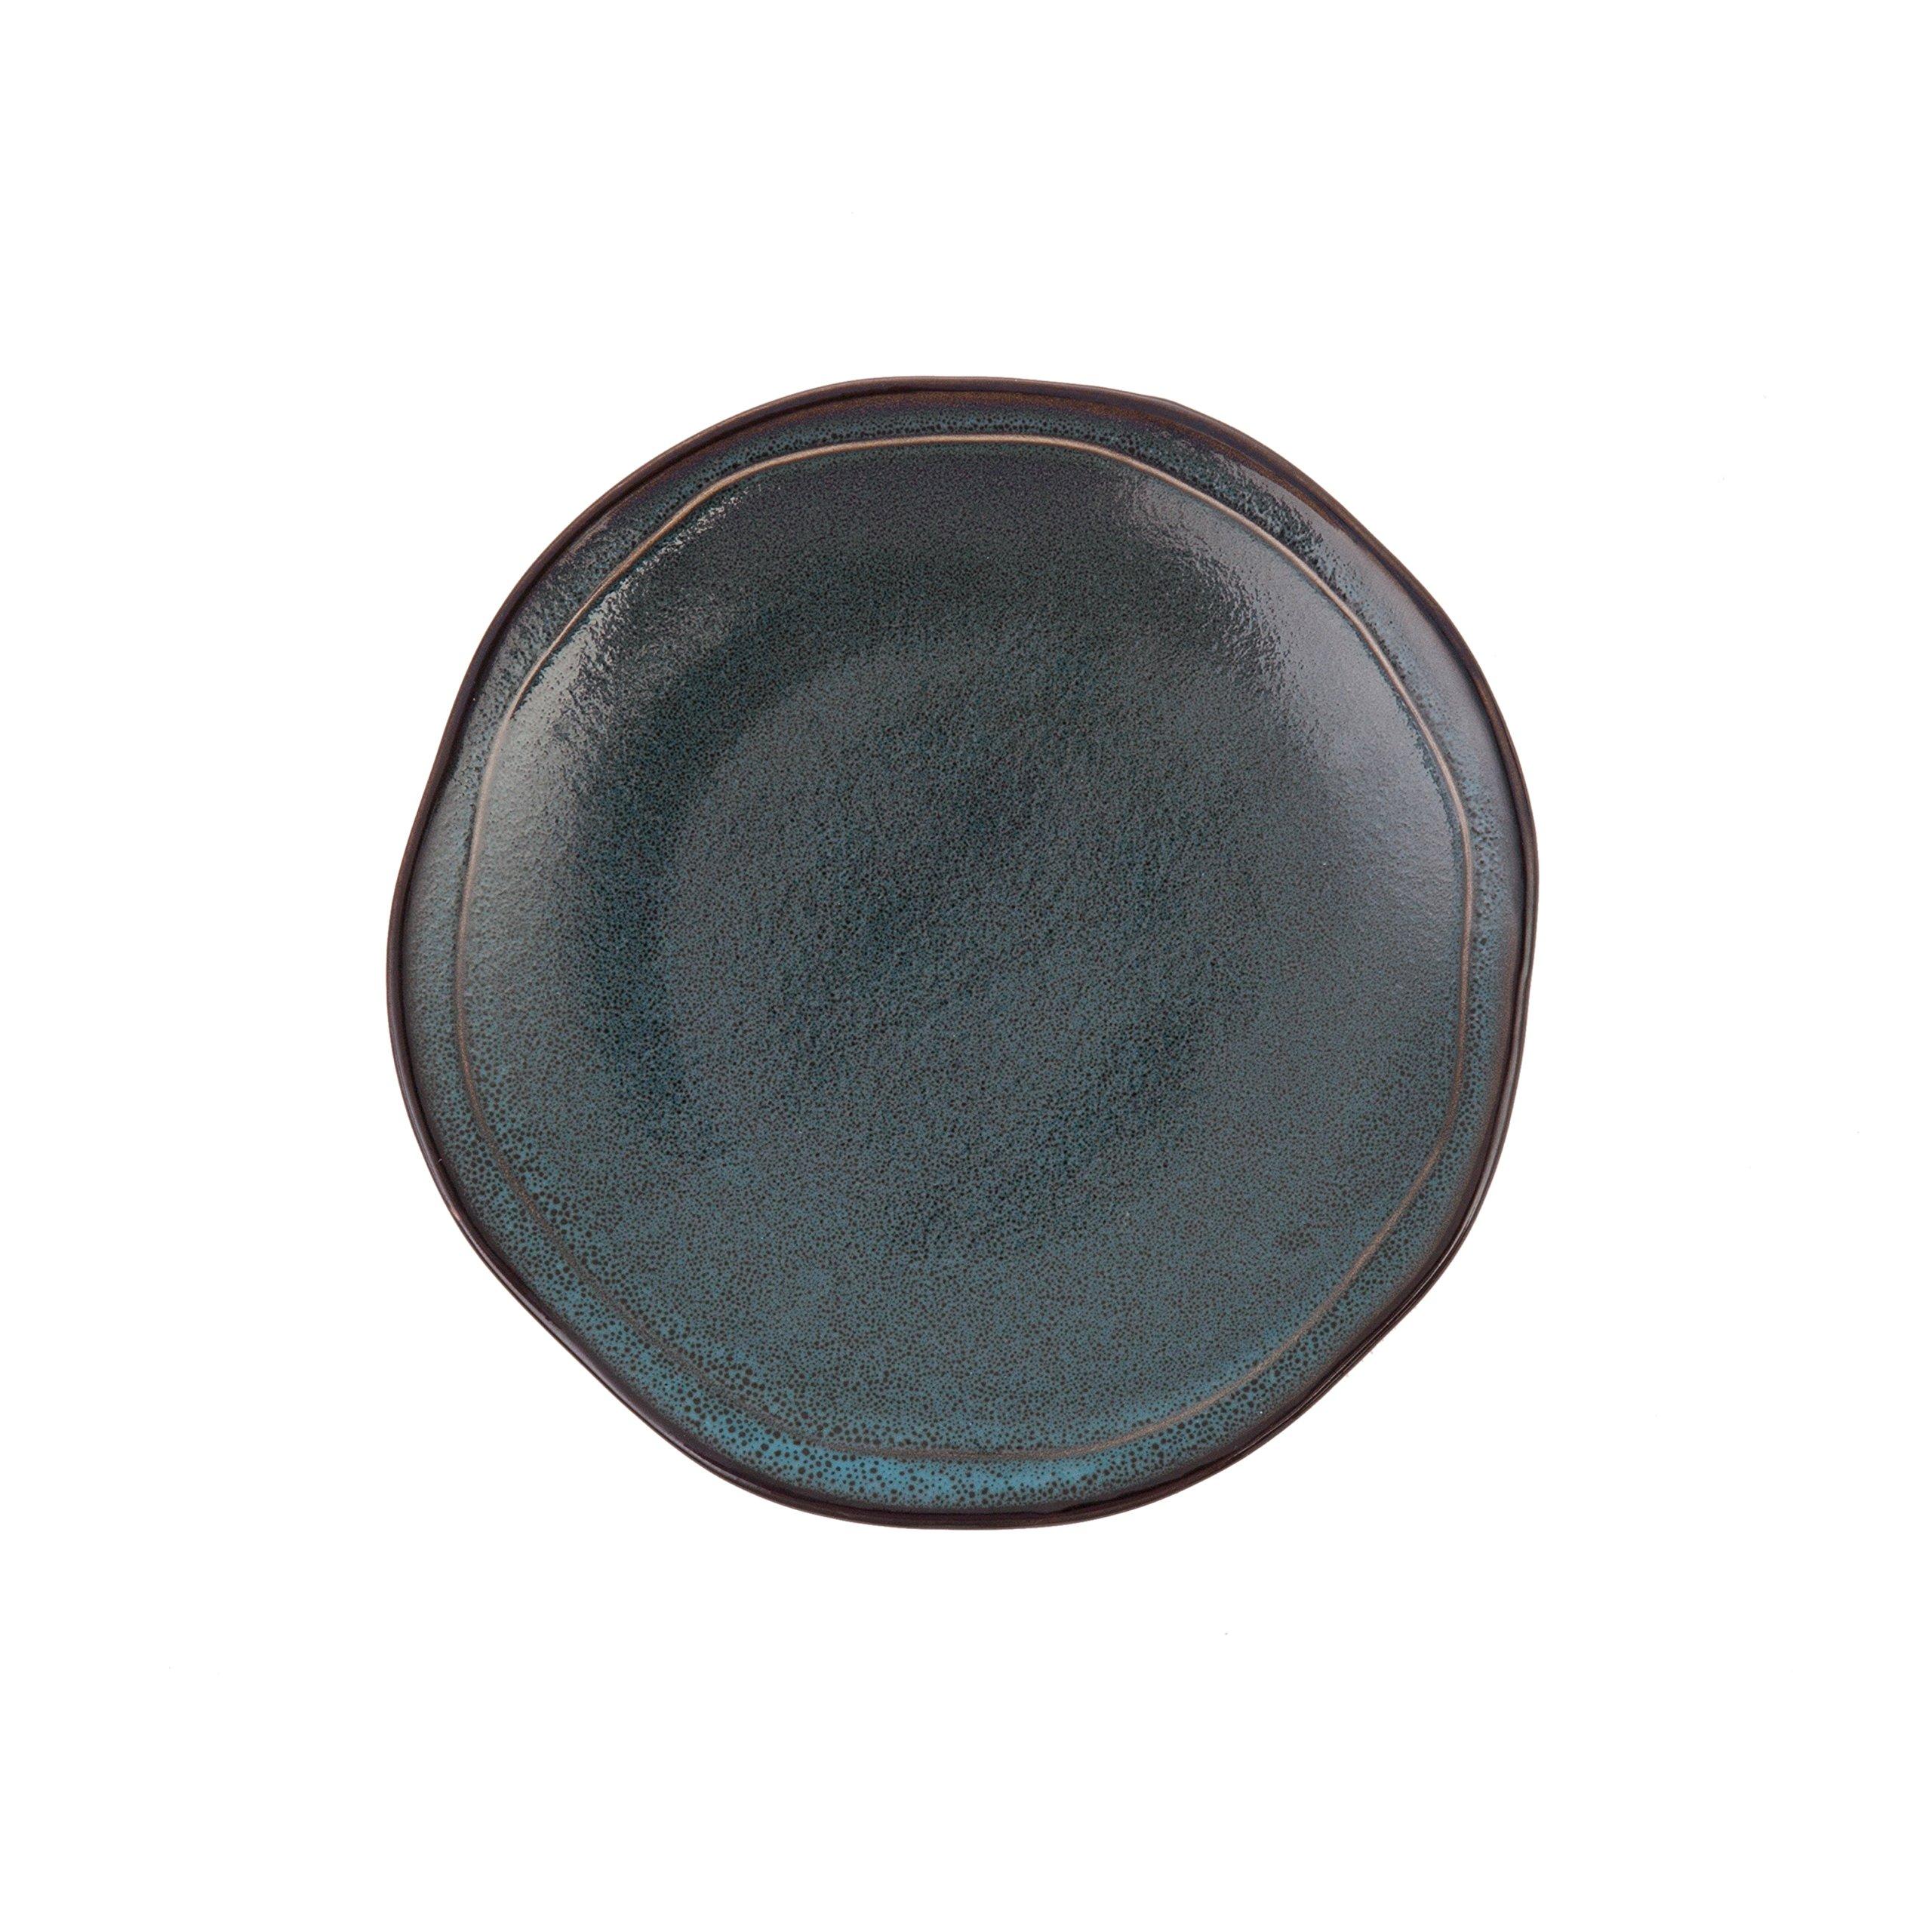 D&V 6 Piece Stōn Porcelain Dinnerware Salad/Dessert Plate Set, 8'', Twilight